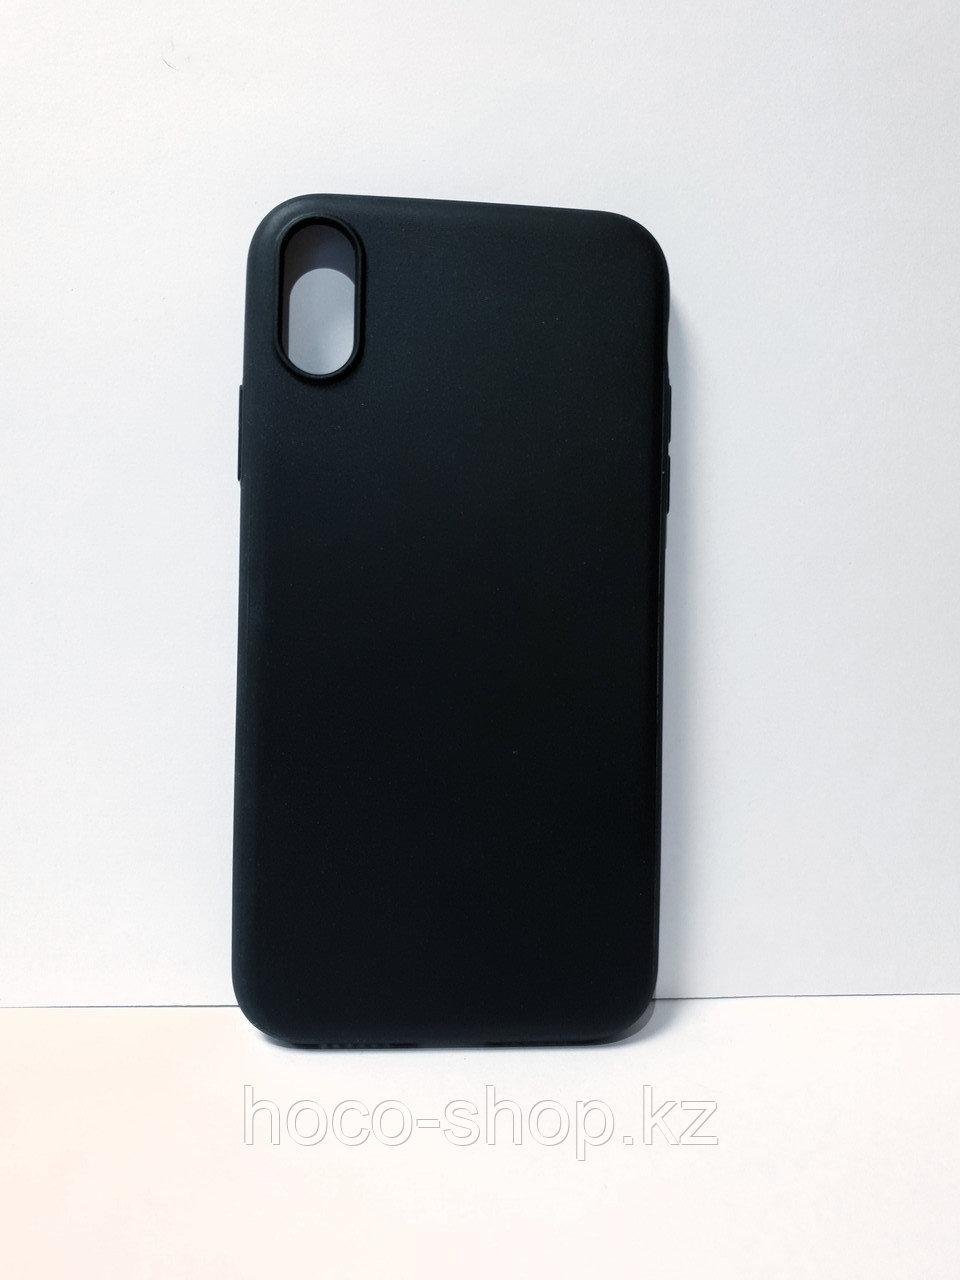 Чехол гель Hoco iPhone XR - фото 1